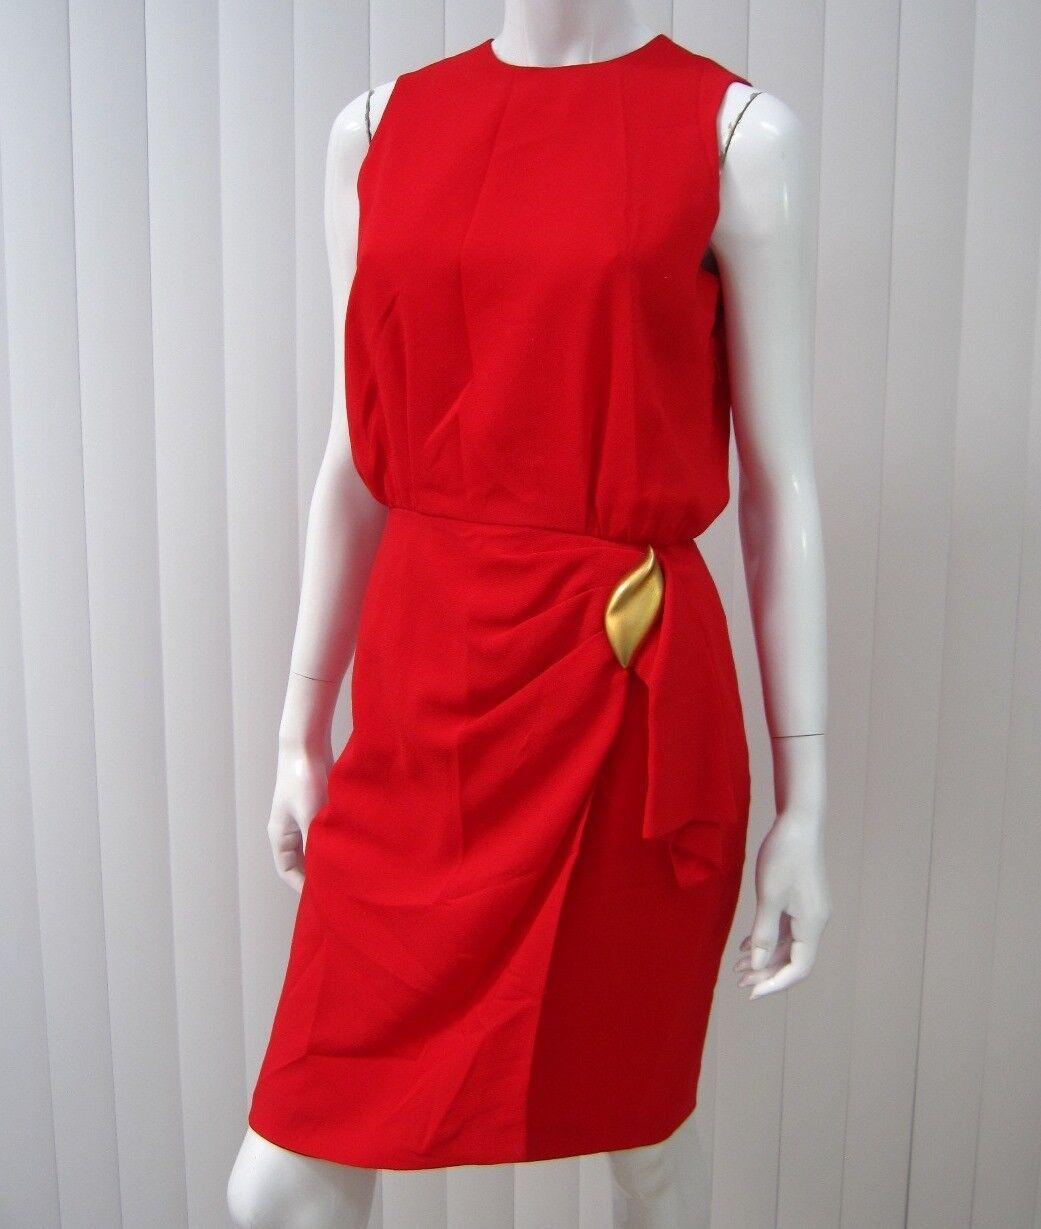 JONES NEW YORK VINTAGE SLEEVELESS DRESS Größe 4 SOLID rot